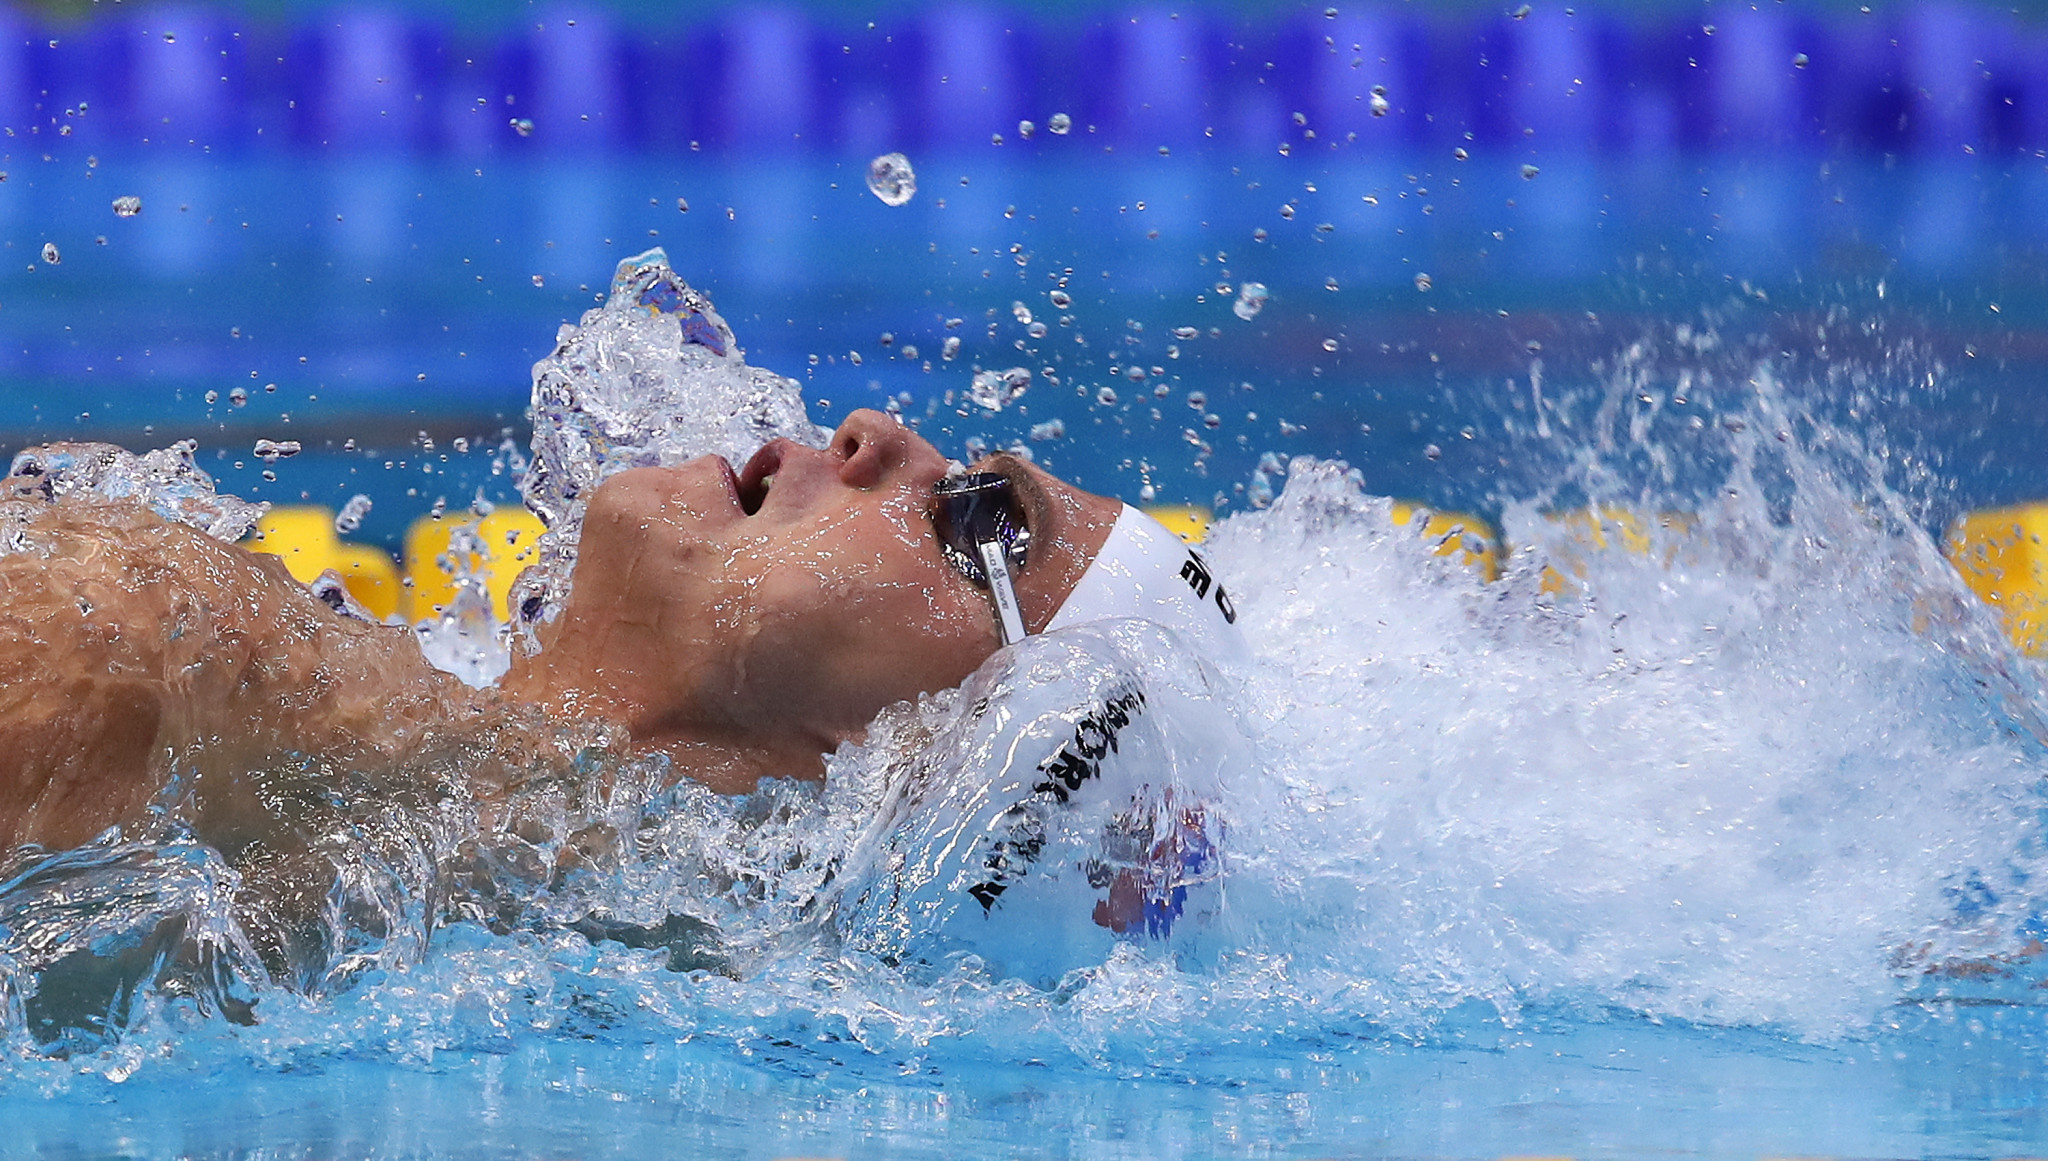 Morozov wins again as Romanchuk breaks record at FINA World Cup